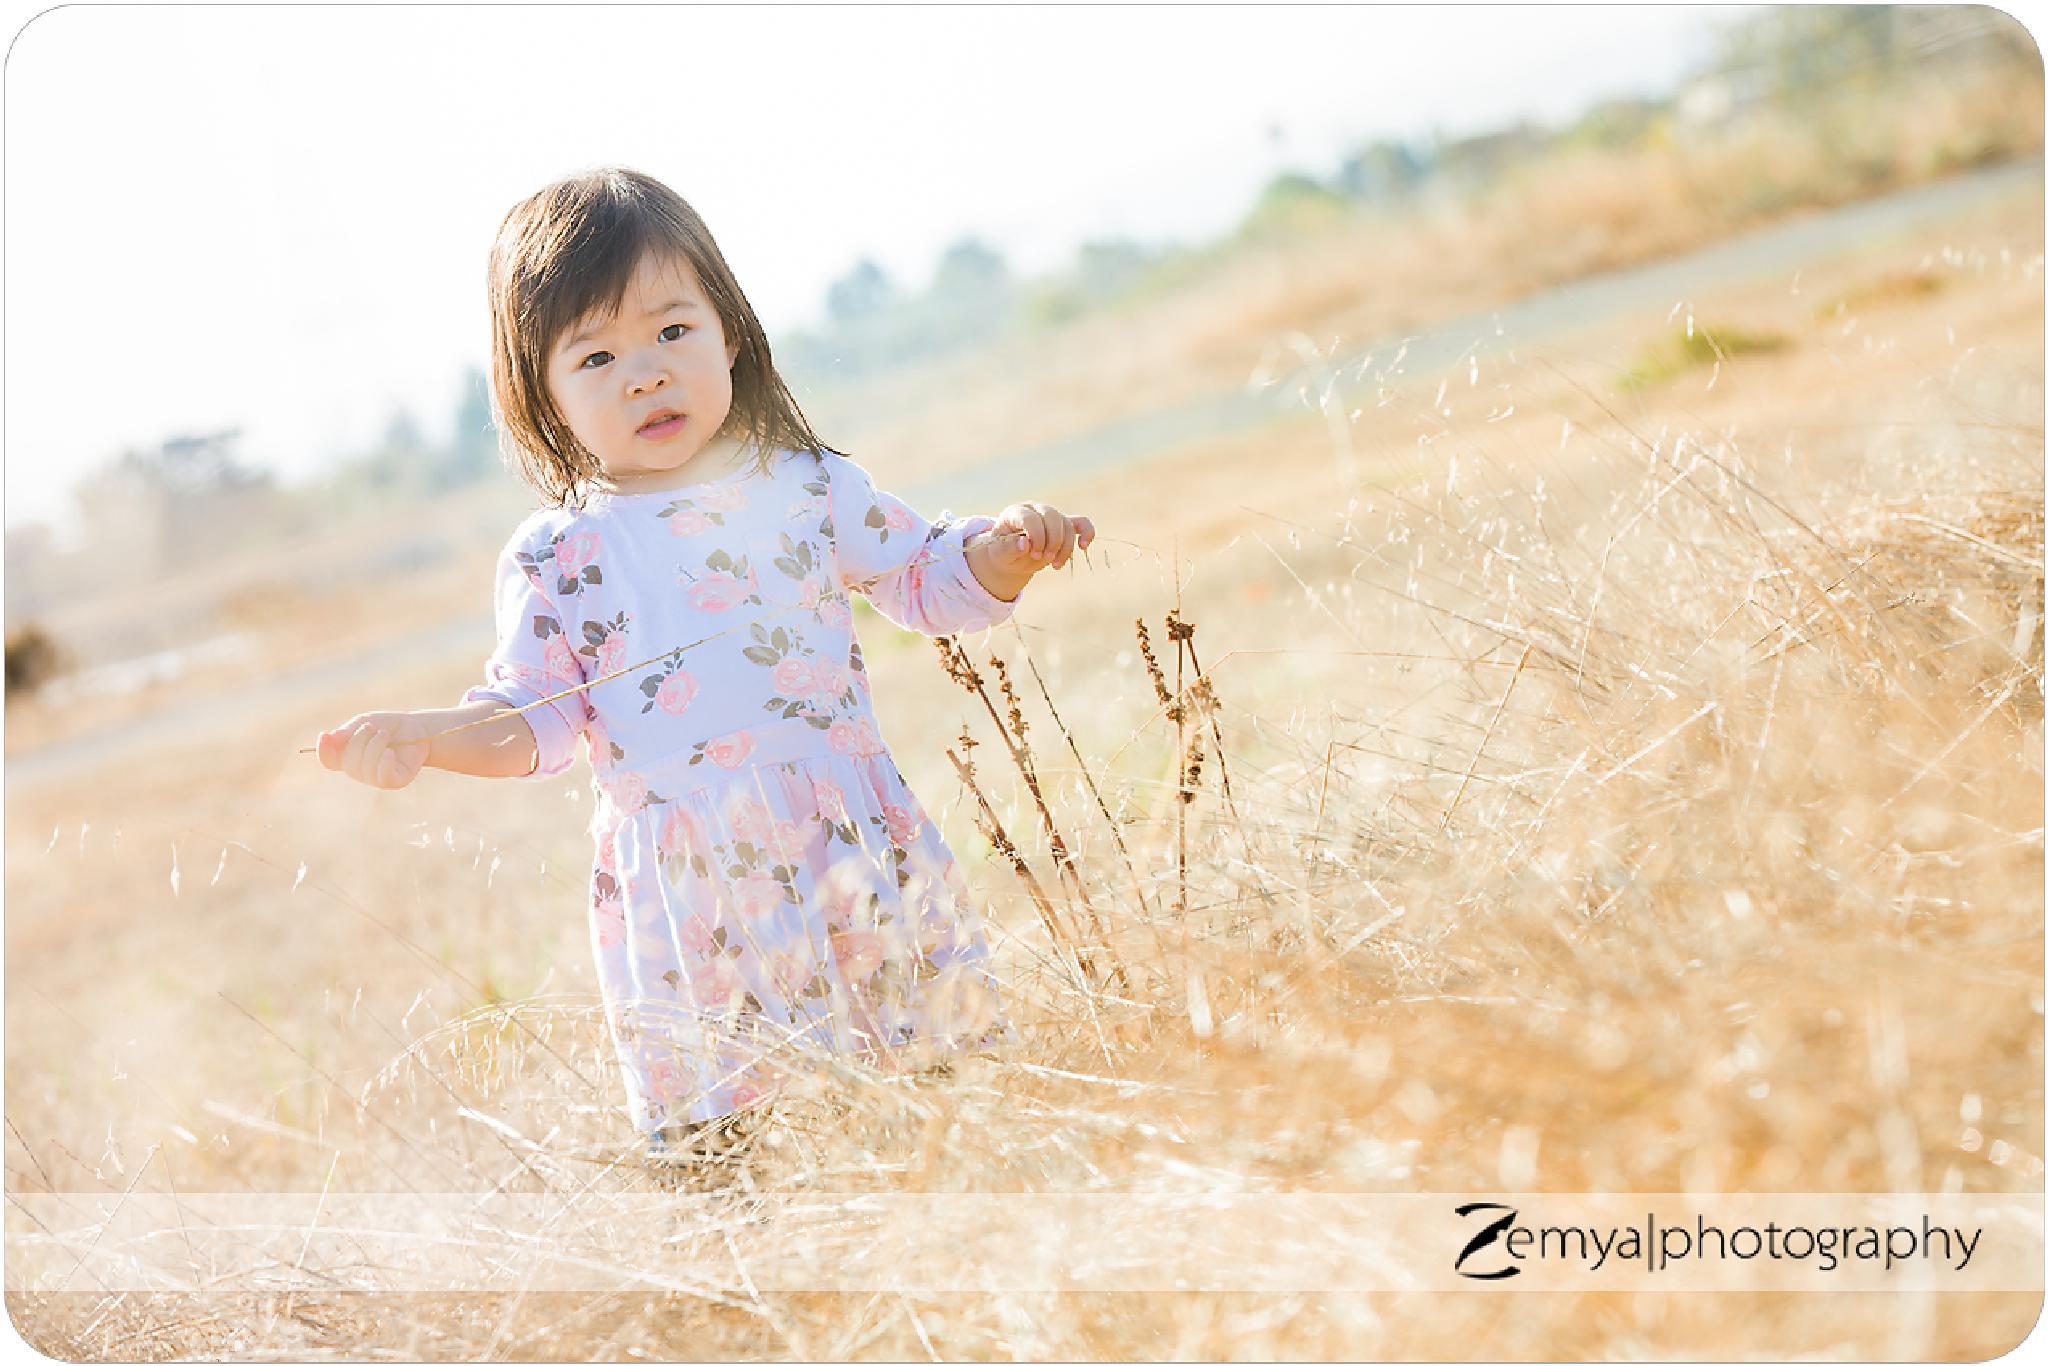 San Mateo child photography by Zemya Photography